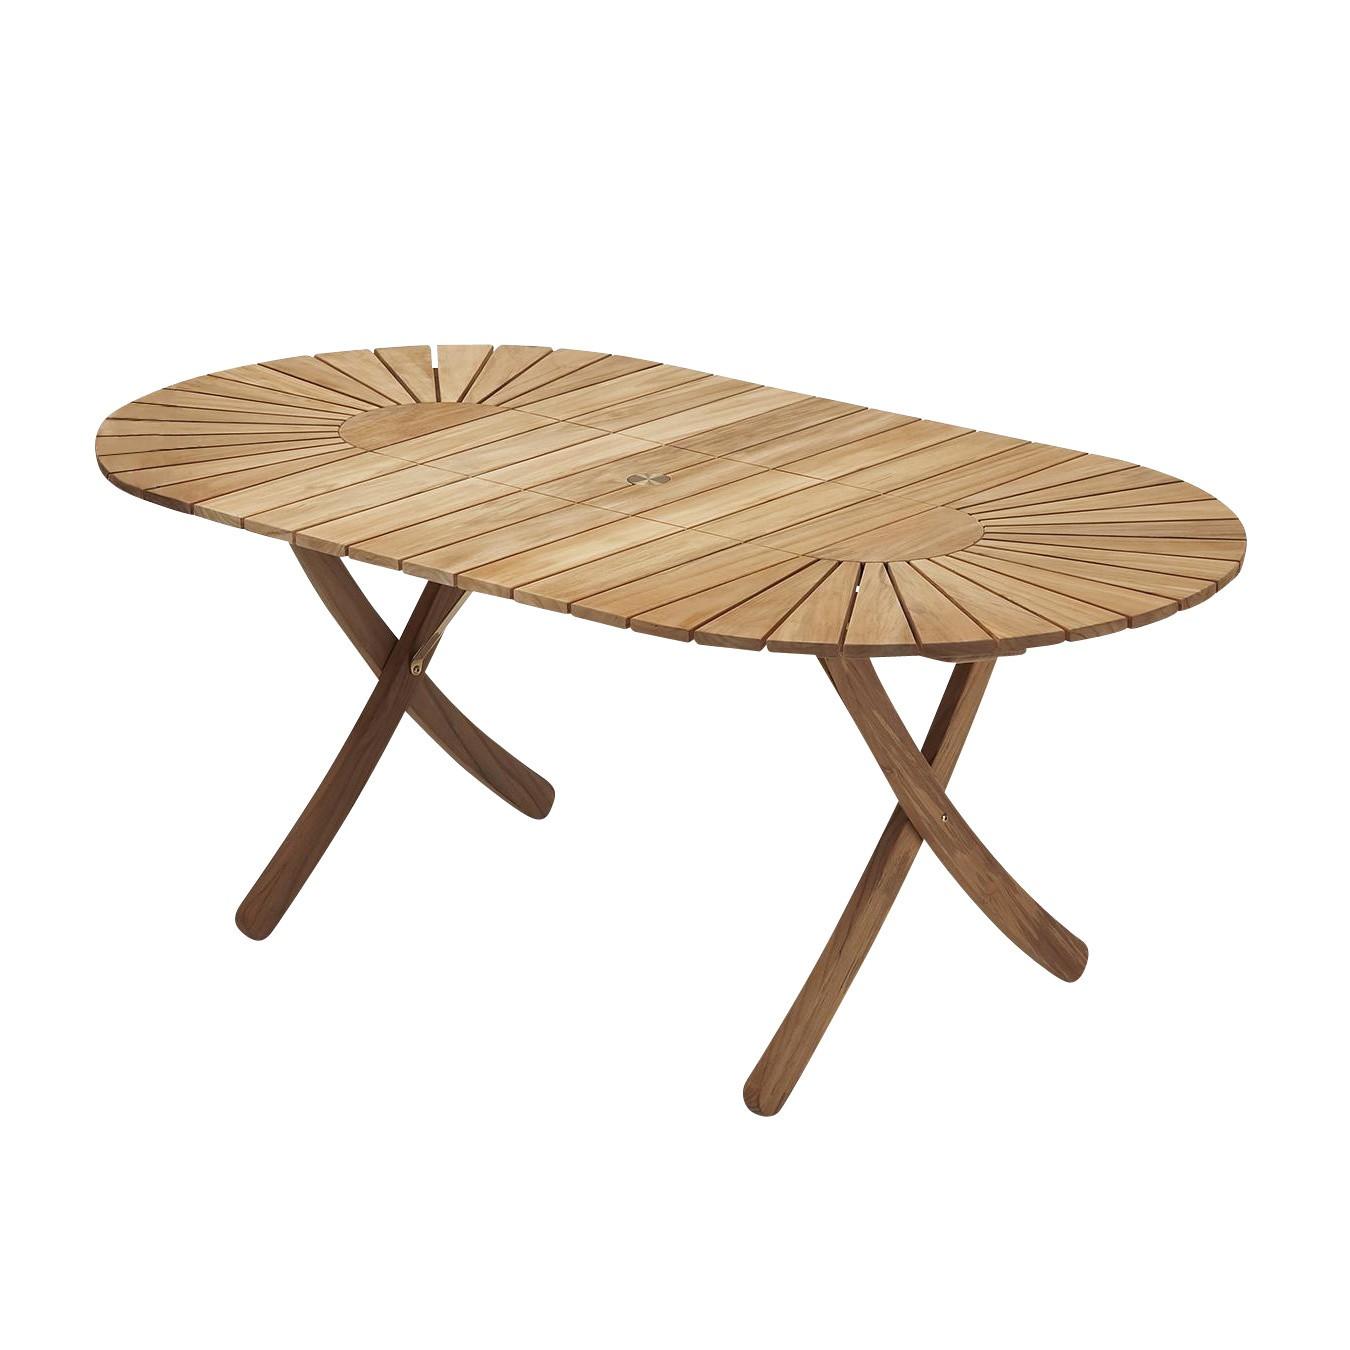 Gartentisch 100 X 80.Selandia Extendable Garden Table 180x100x73cm